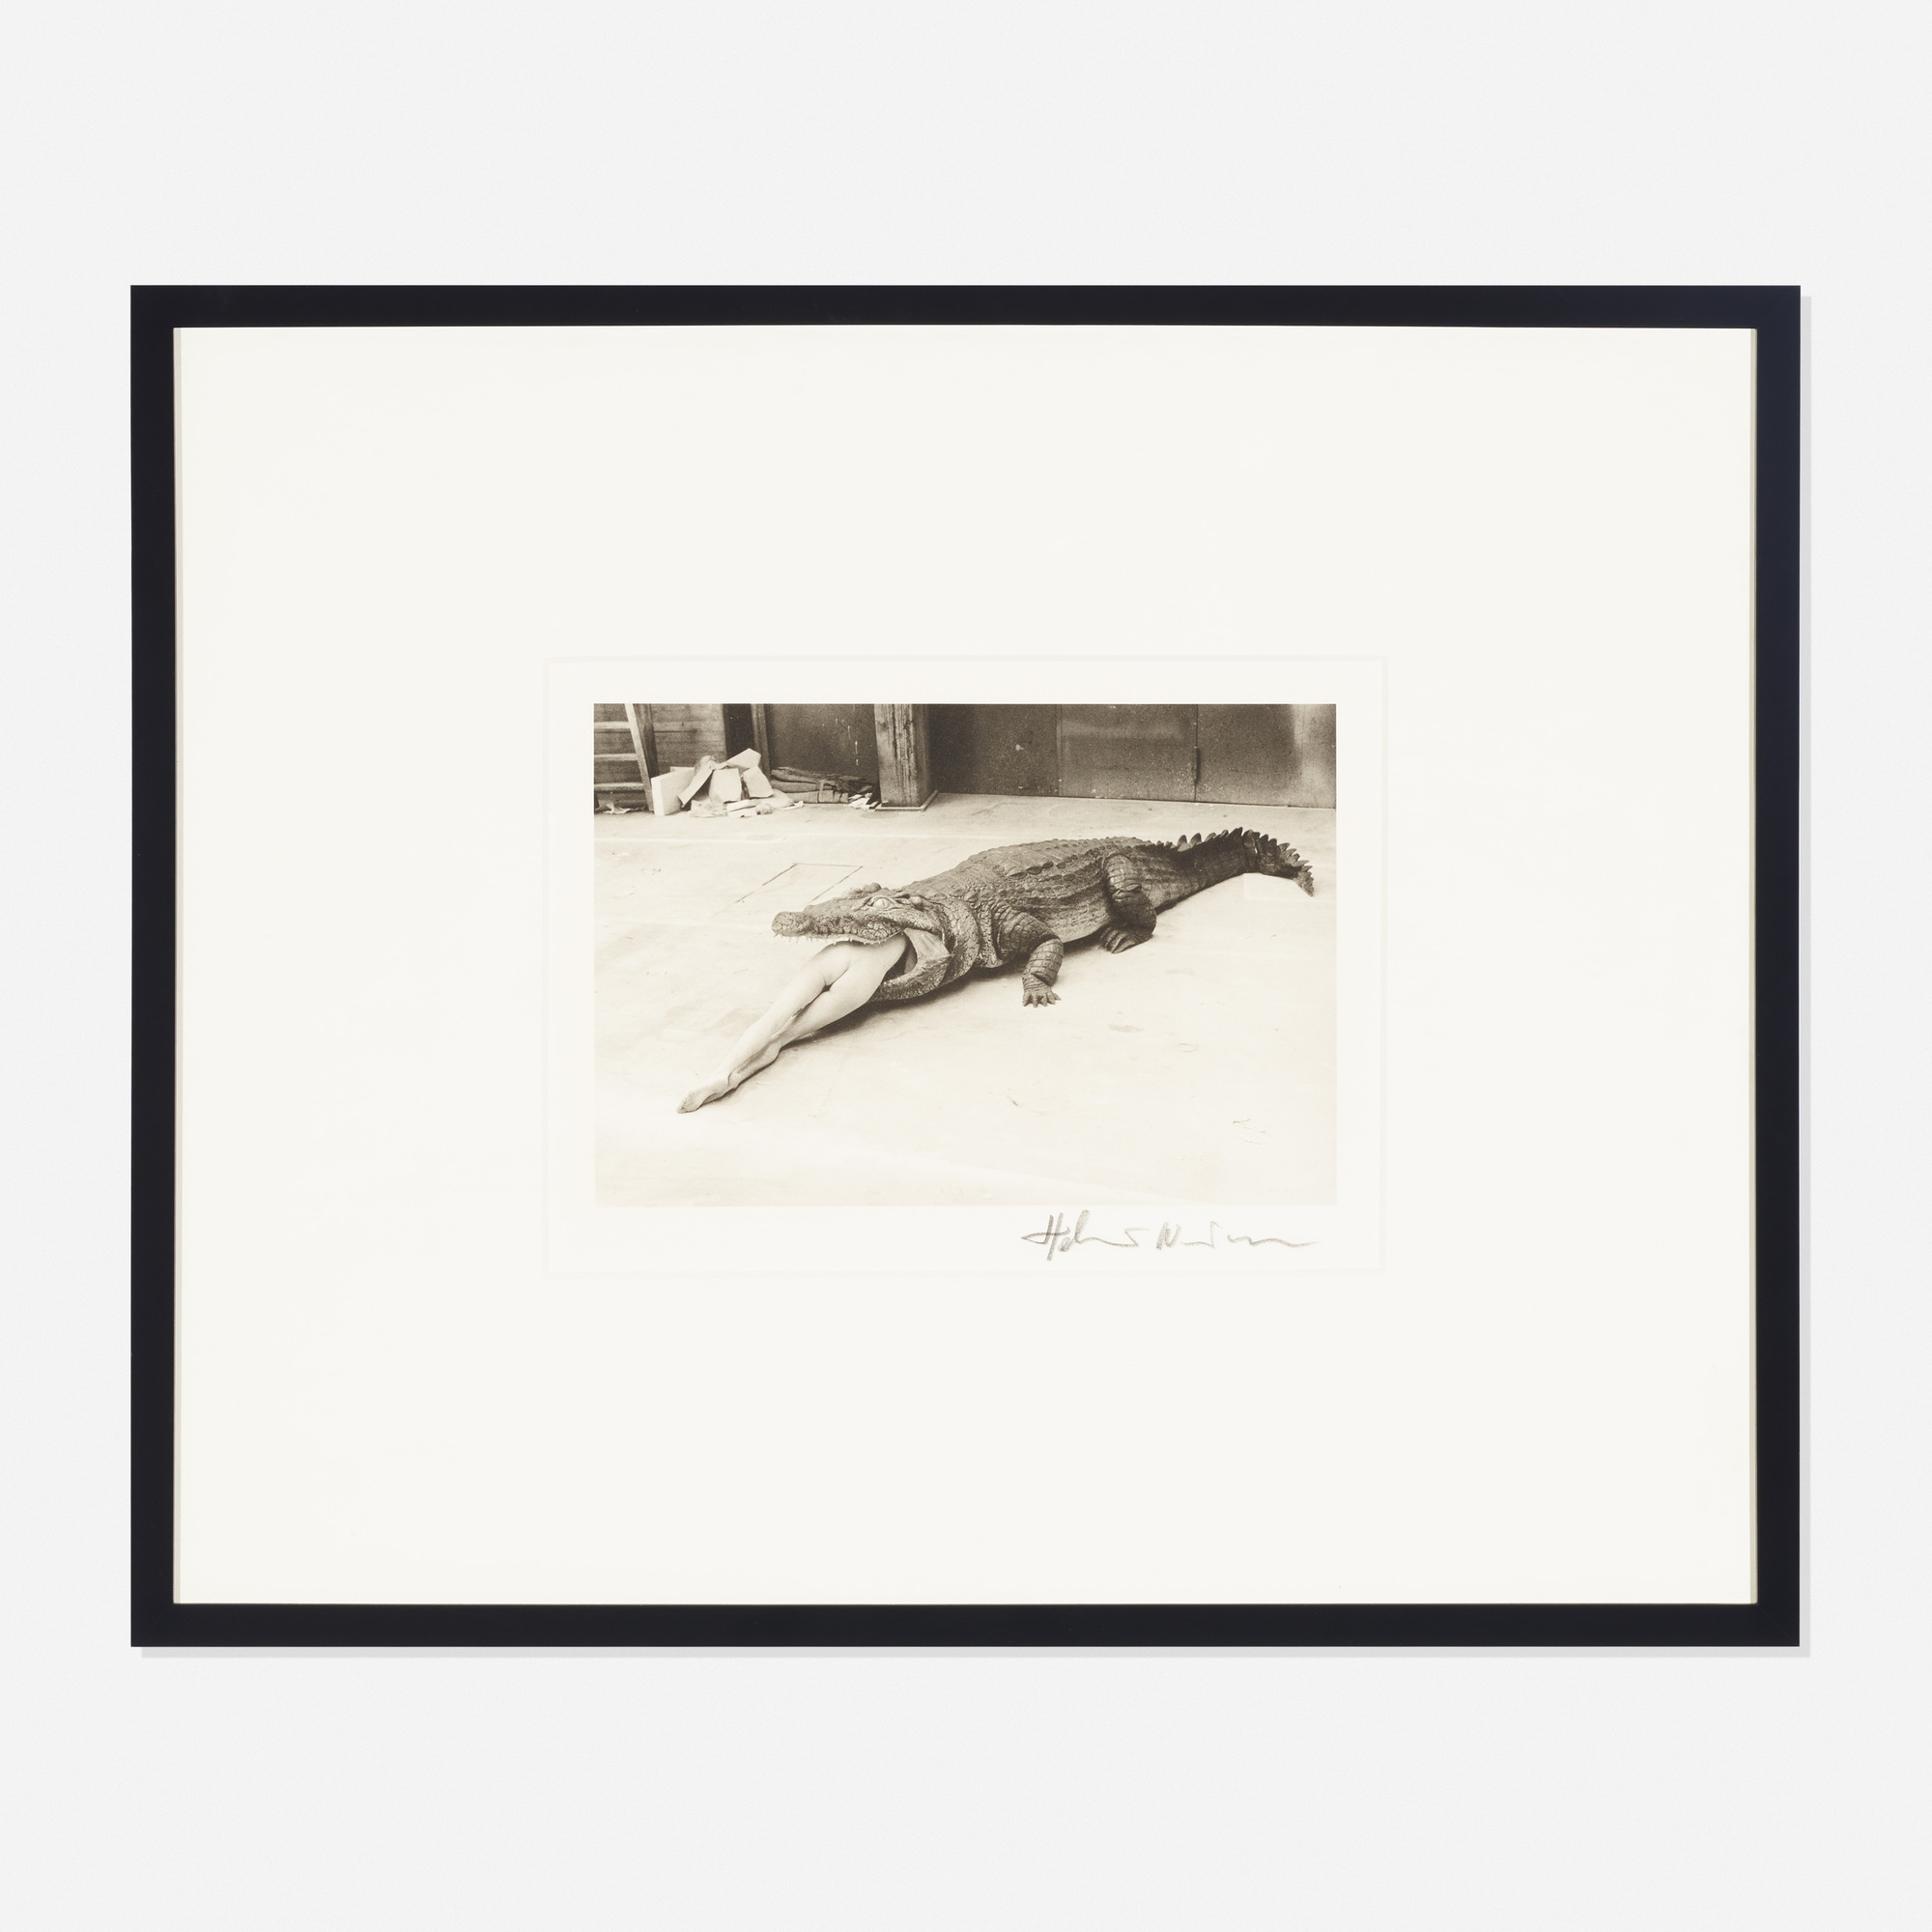 292: Helmut Newton / Crocodile Eating Ballerina (1 of 3)